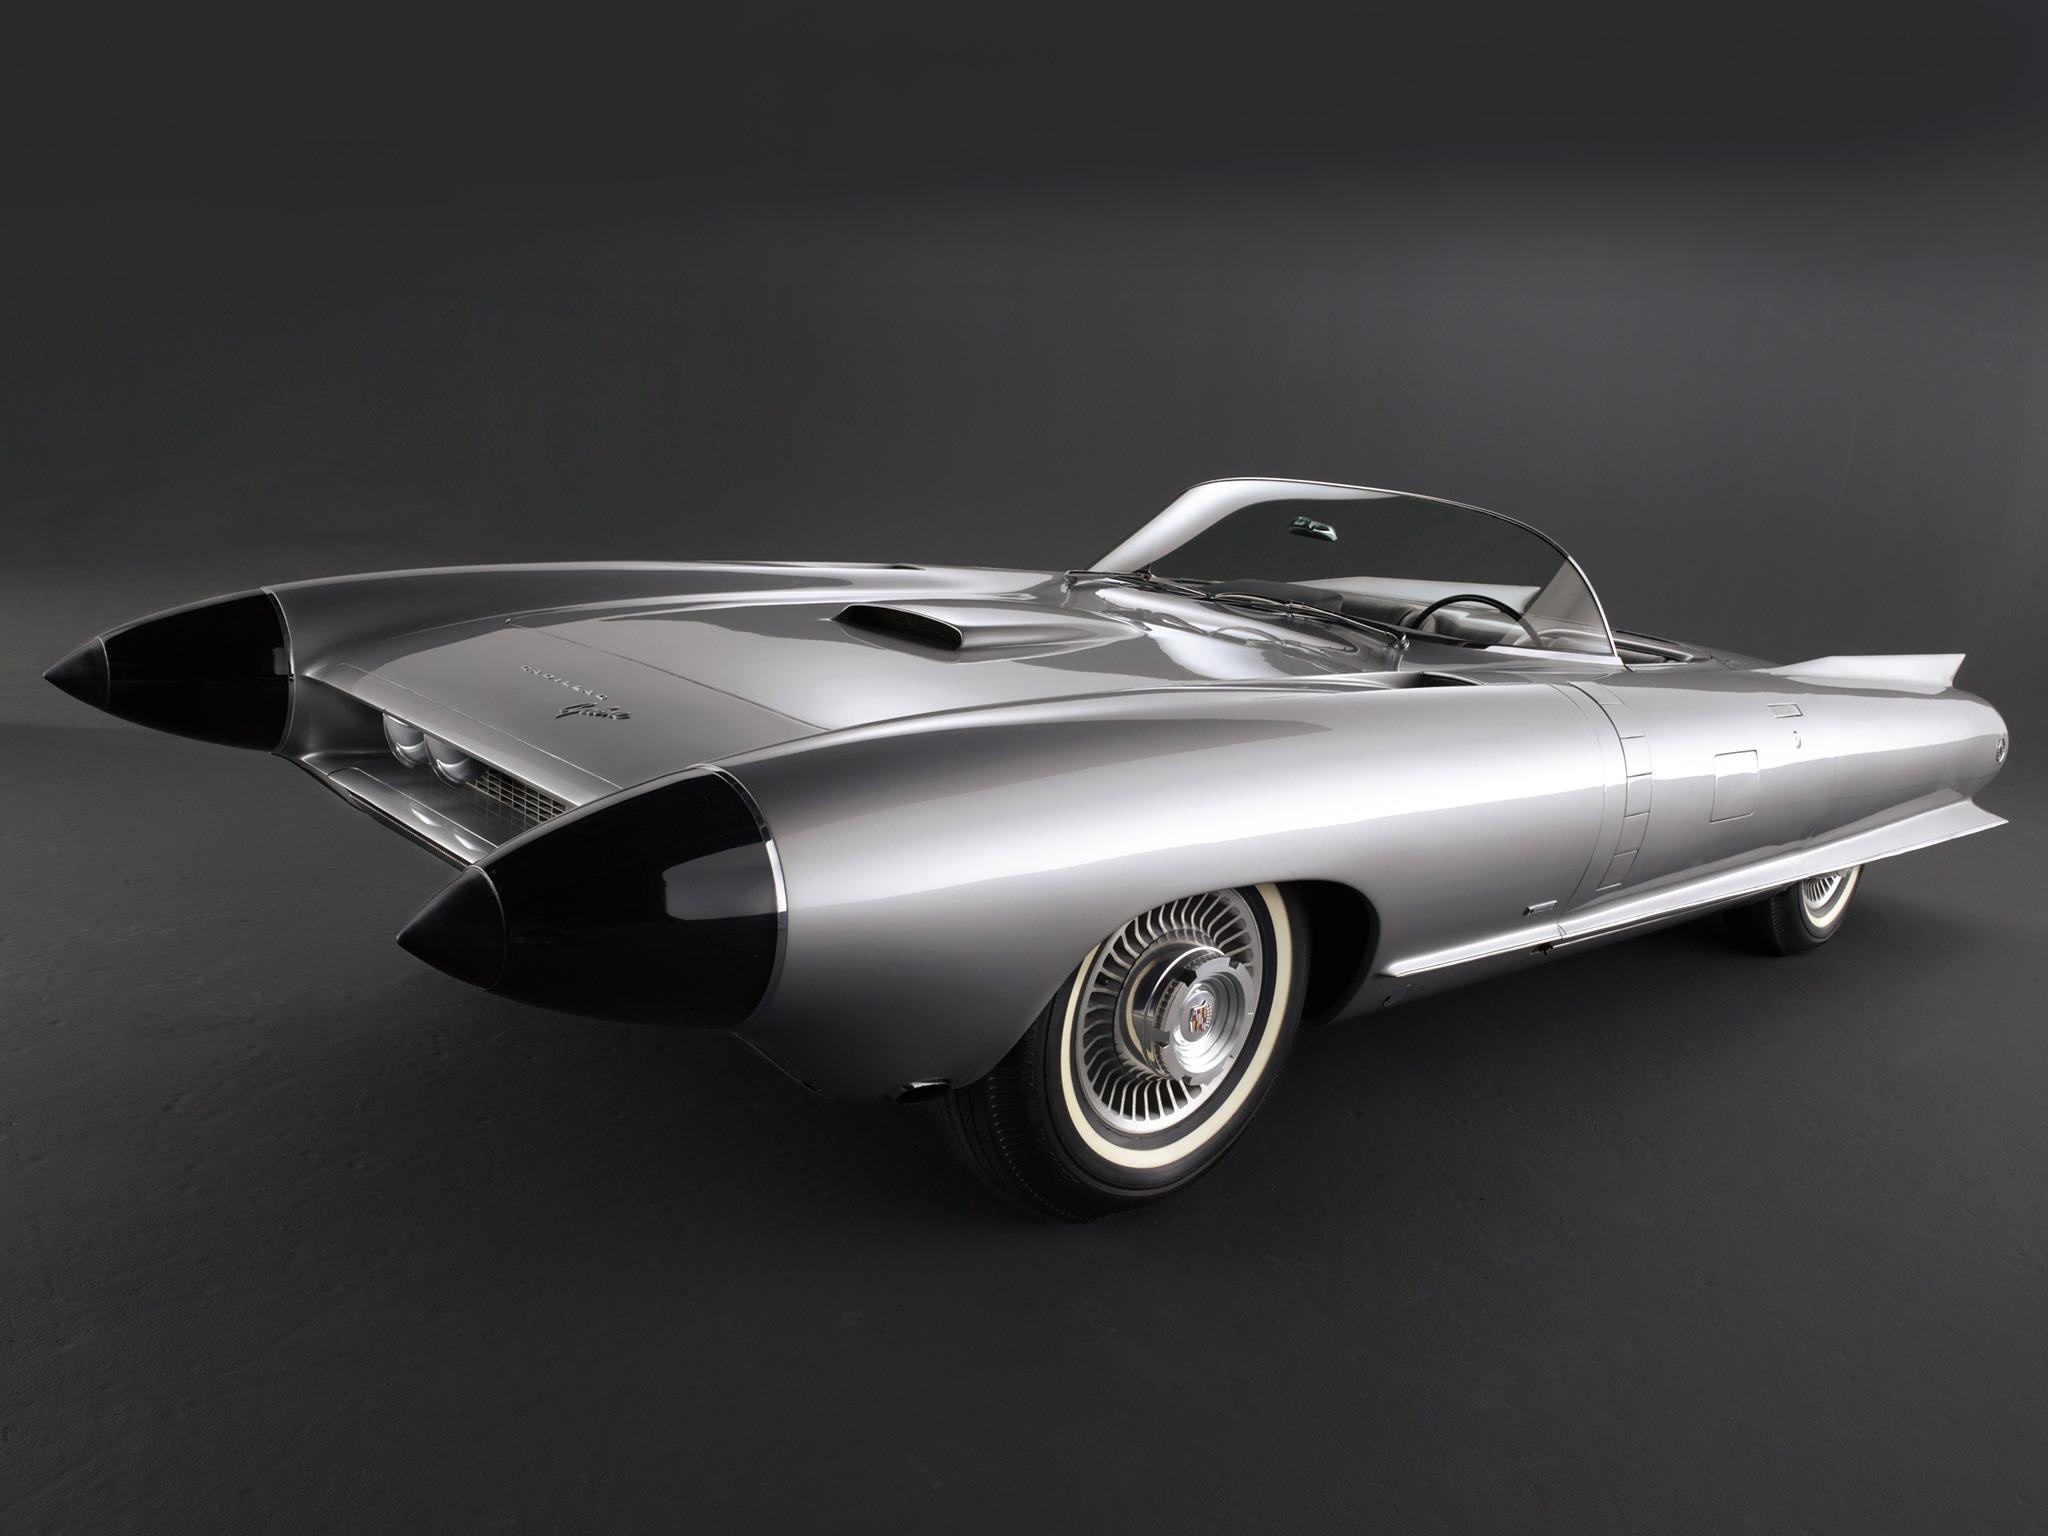 Cadillac Dealer Near Me >> Cadillac Cyclone (1959) - Old Concept Cars